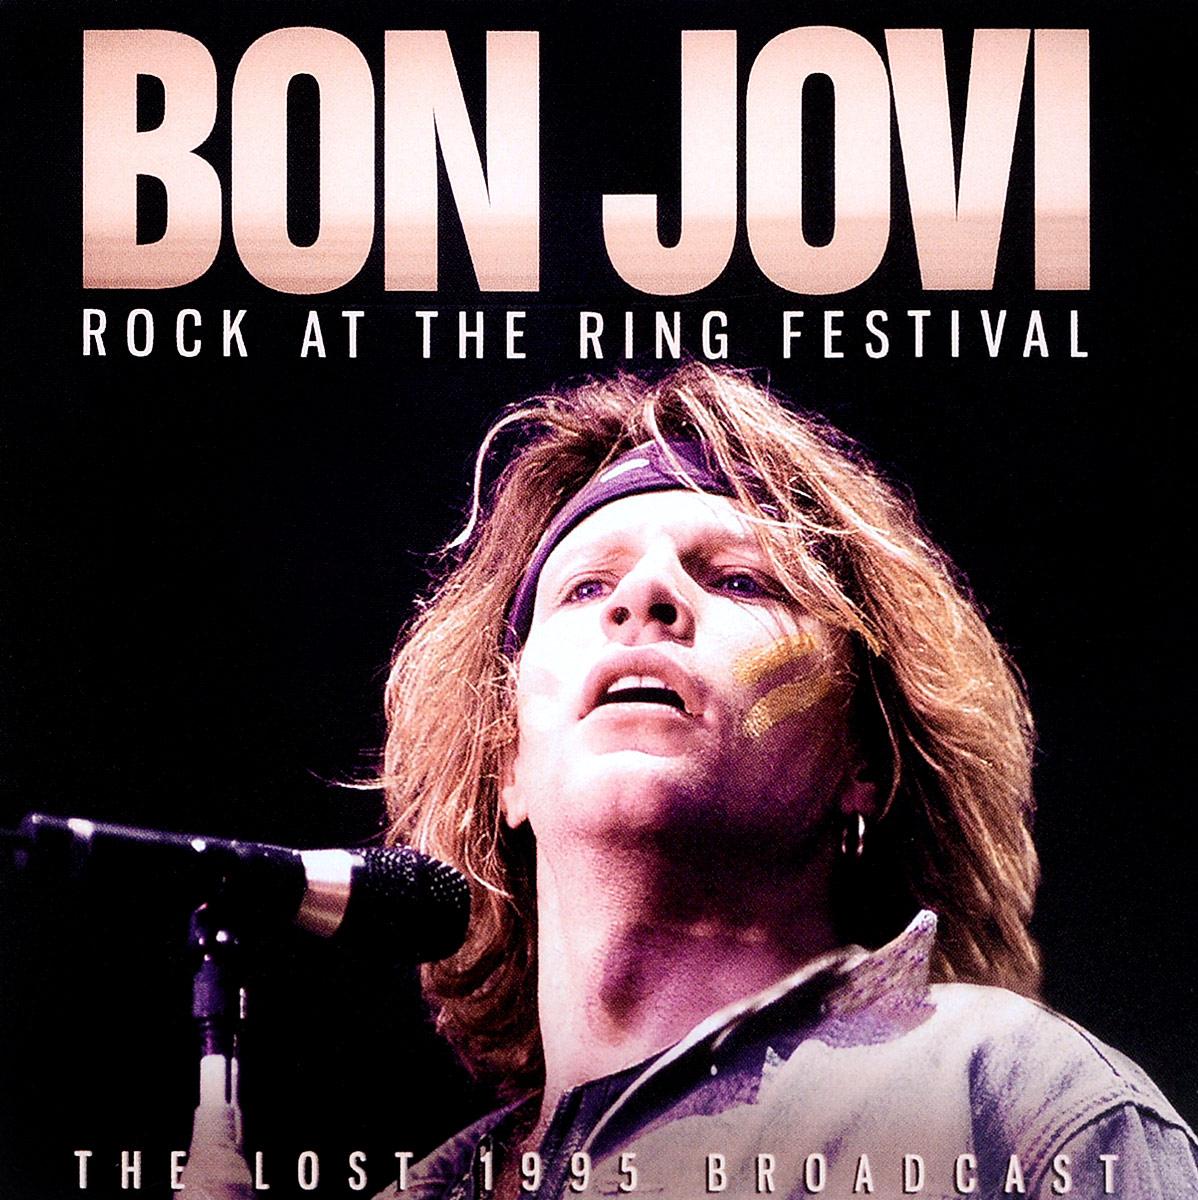 Bon Jovi Bon Jovi. Rock at the Ring Festival pentaport rock festival 2018 incheon sunday